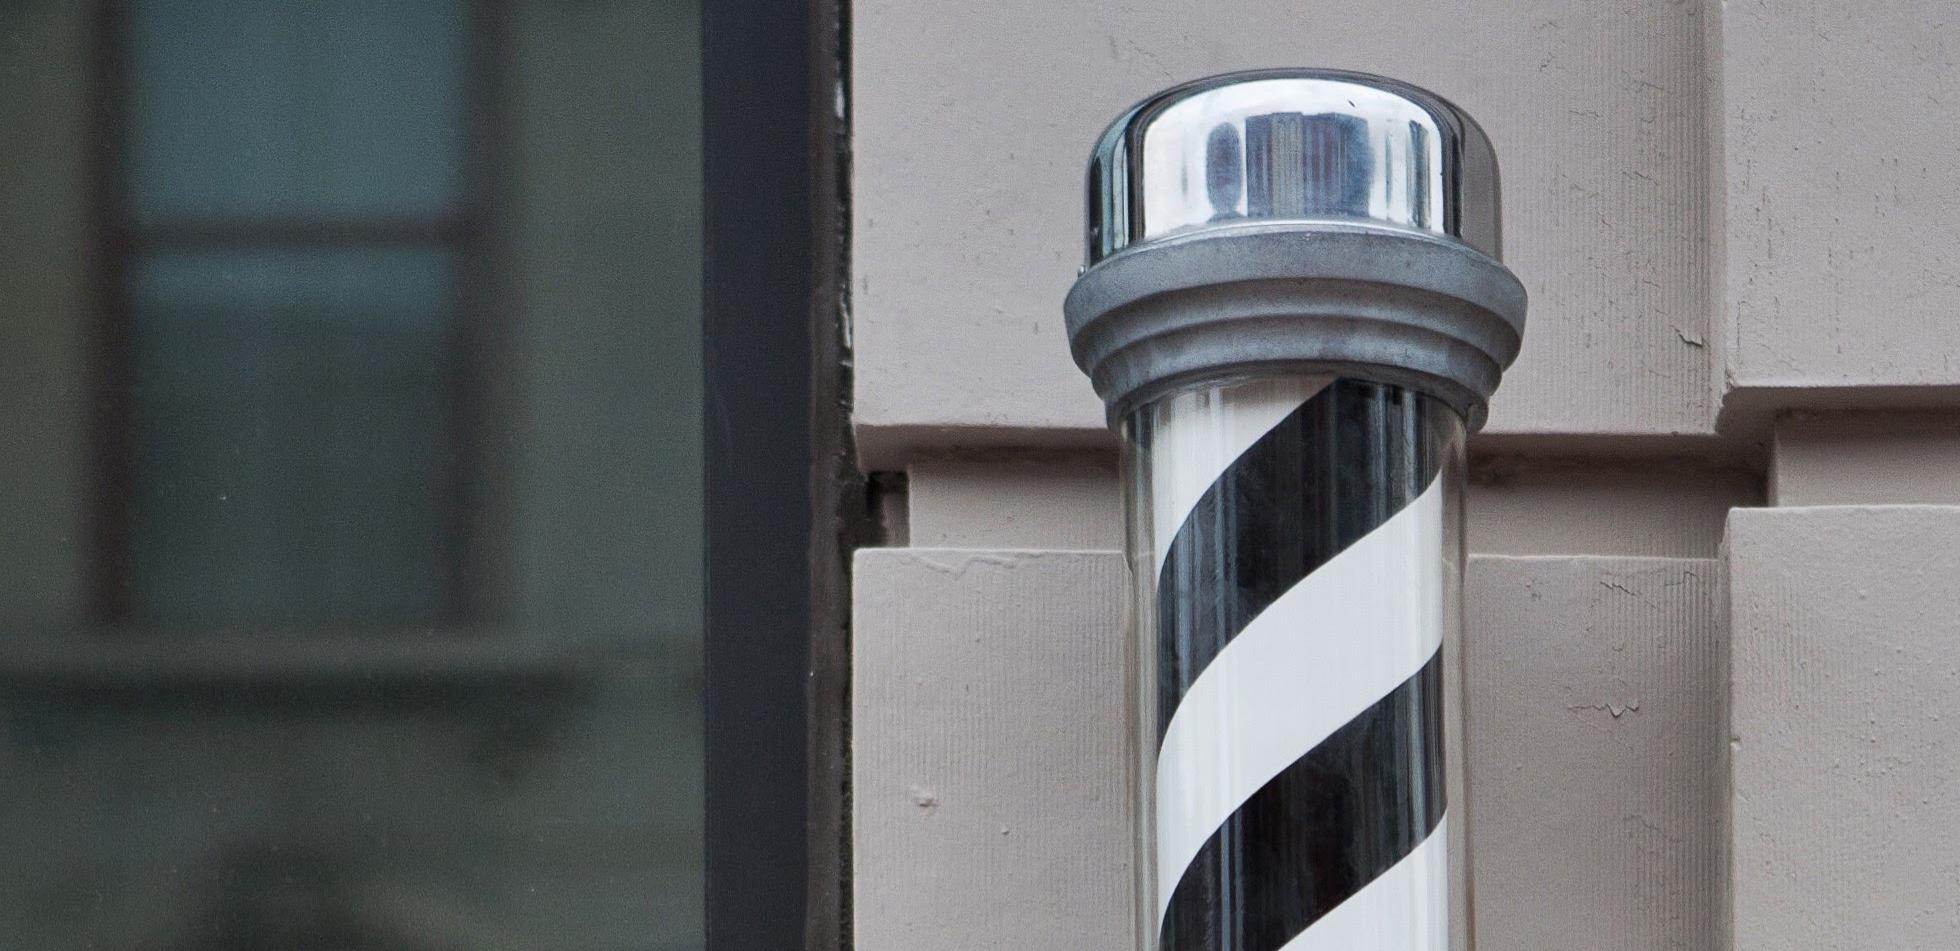 Cutman-Barber-Pole.jpg